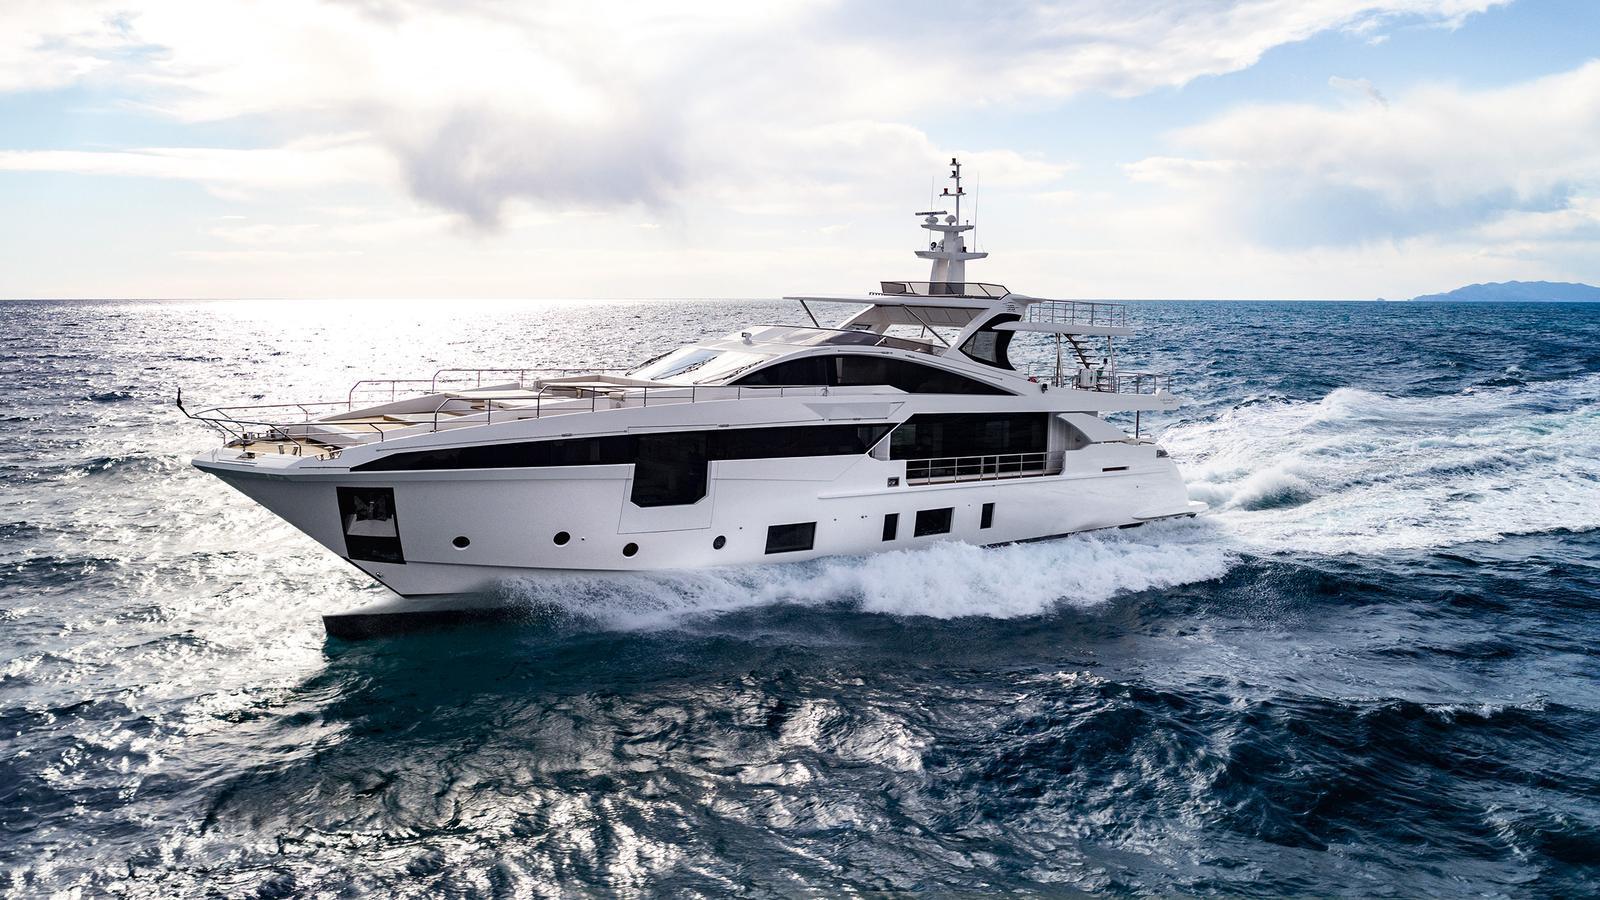 Grande 35 Metri motoryacht azimut yachts 35m 2018 side profile sistership